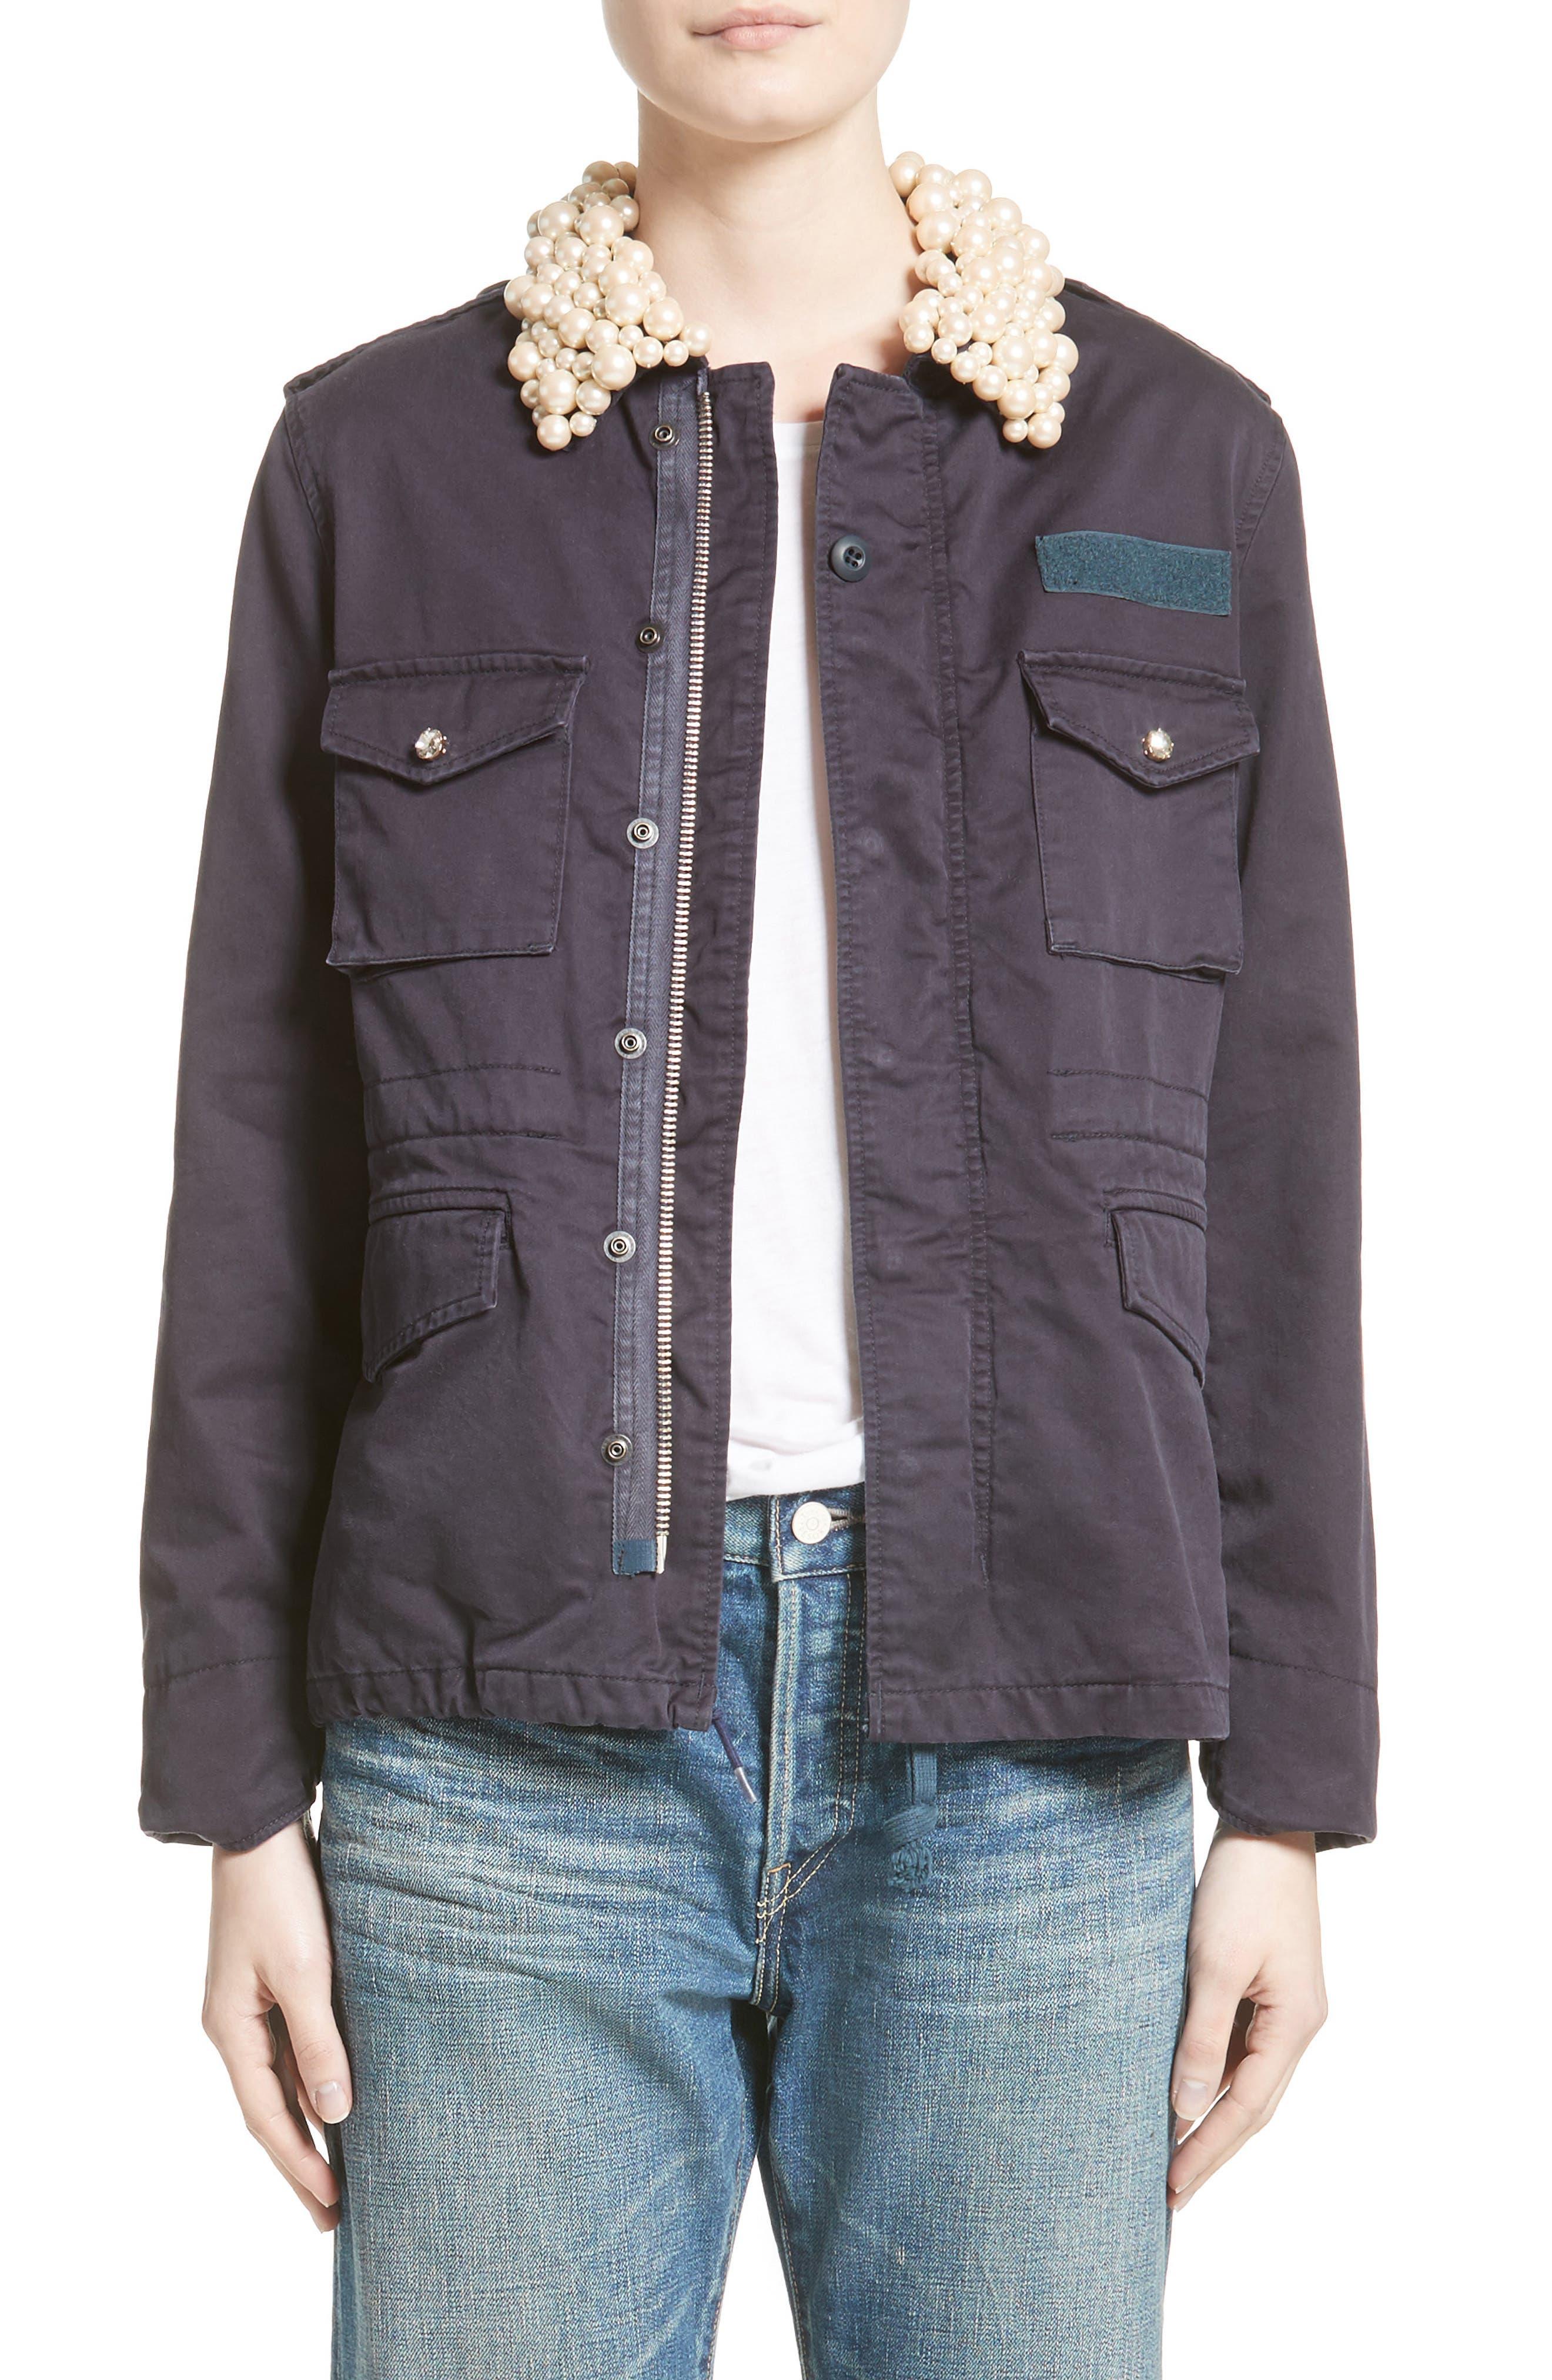 Tu es mon TR�_SOR Imitation Pearl Embellished Military Jacket - TU ES MON TRESOR